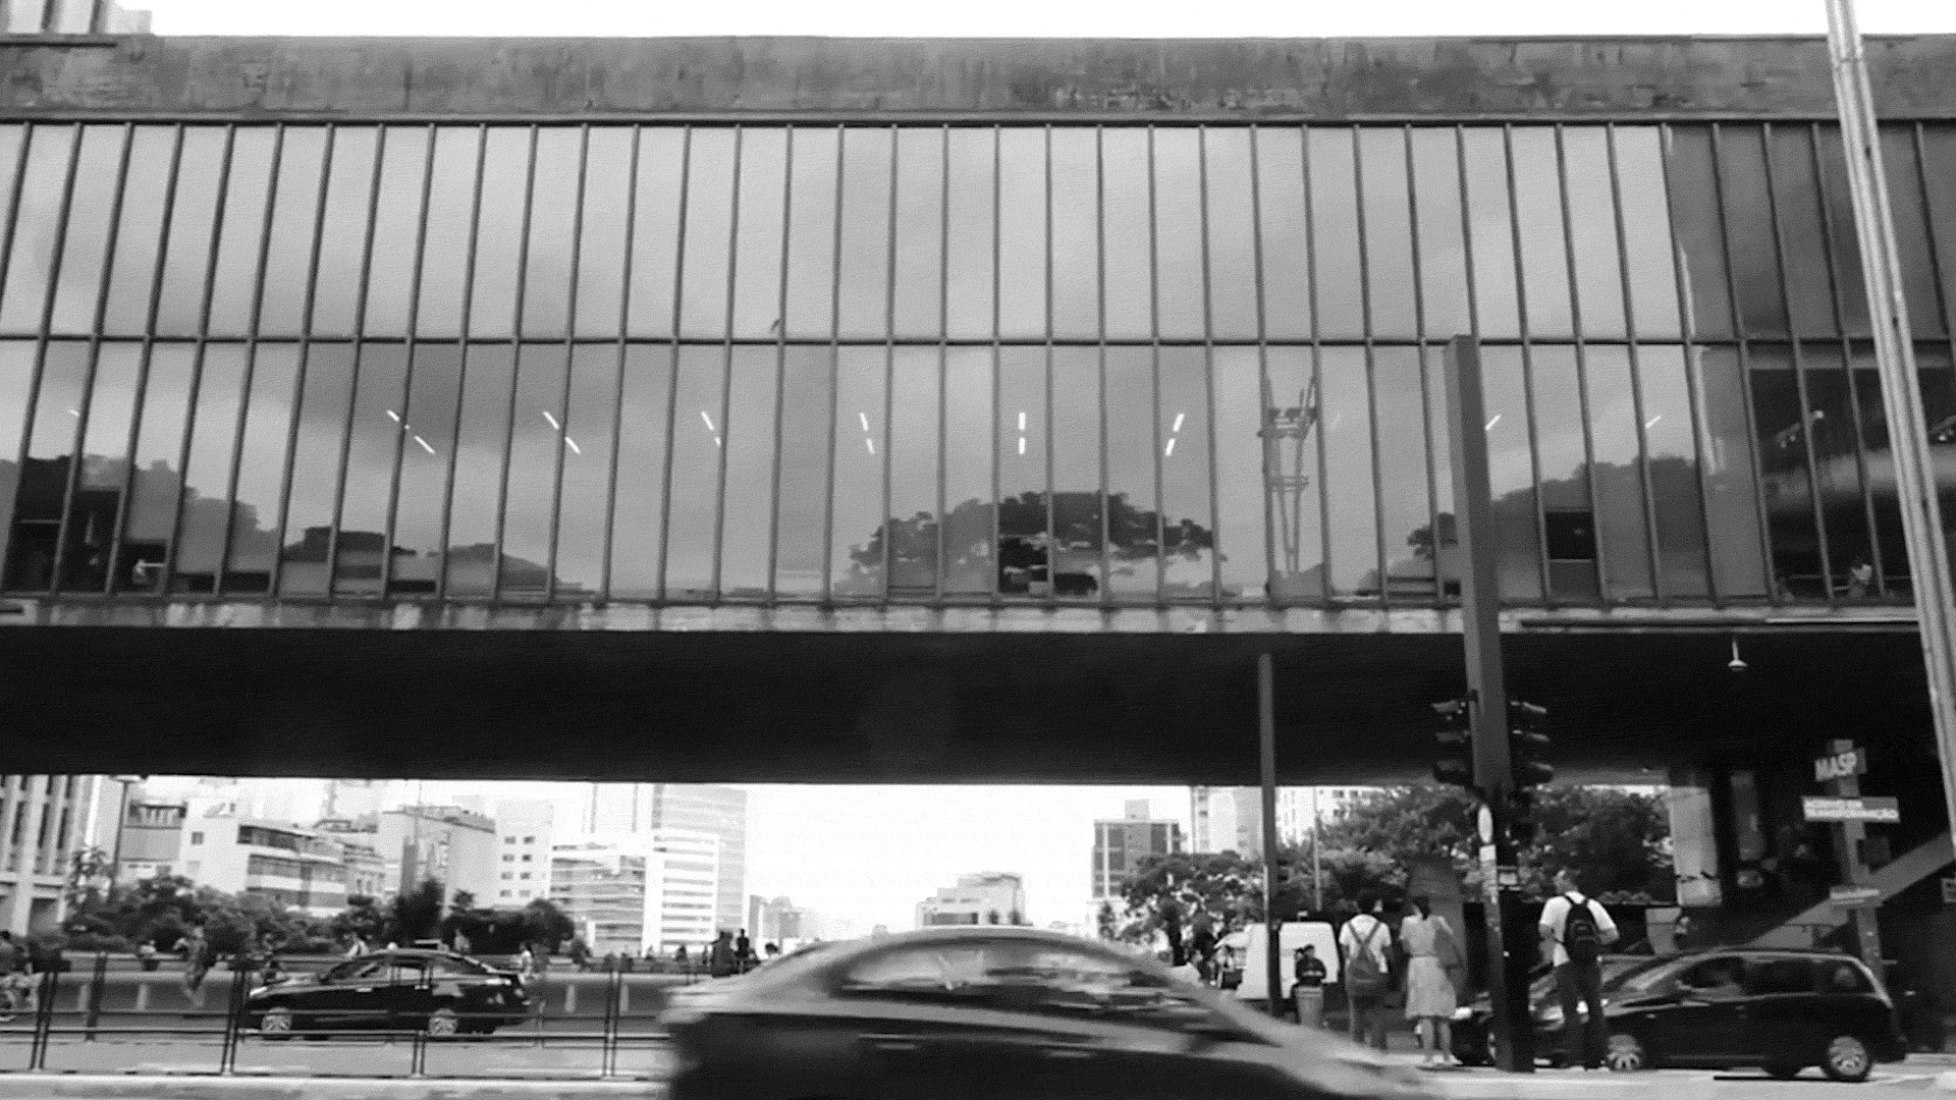 Infinito Vão - 90 años de arquitectura brasileña. Cortesía de Casa da Arquitectura